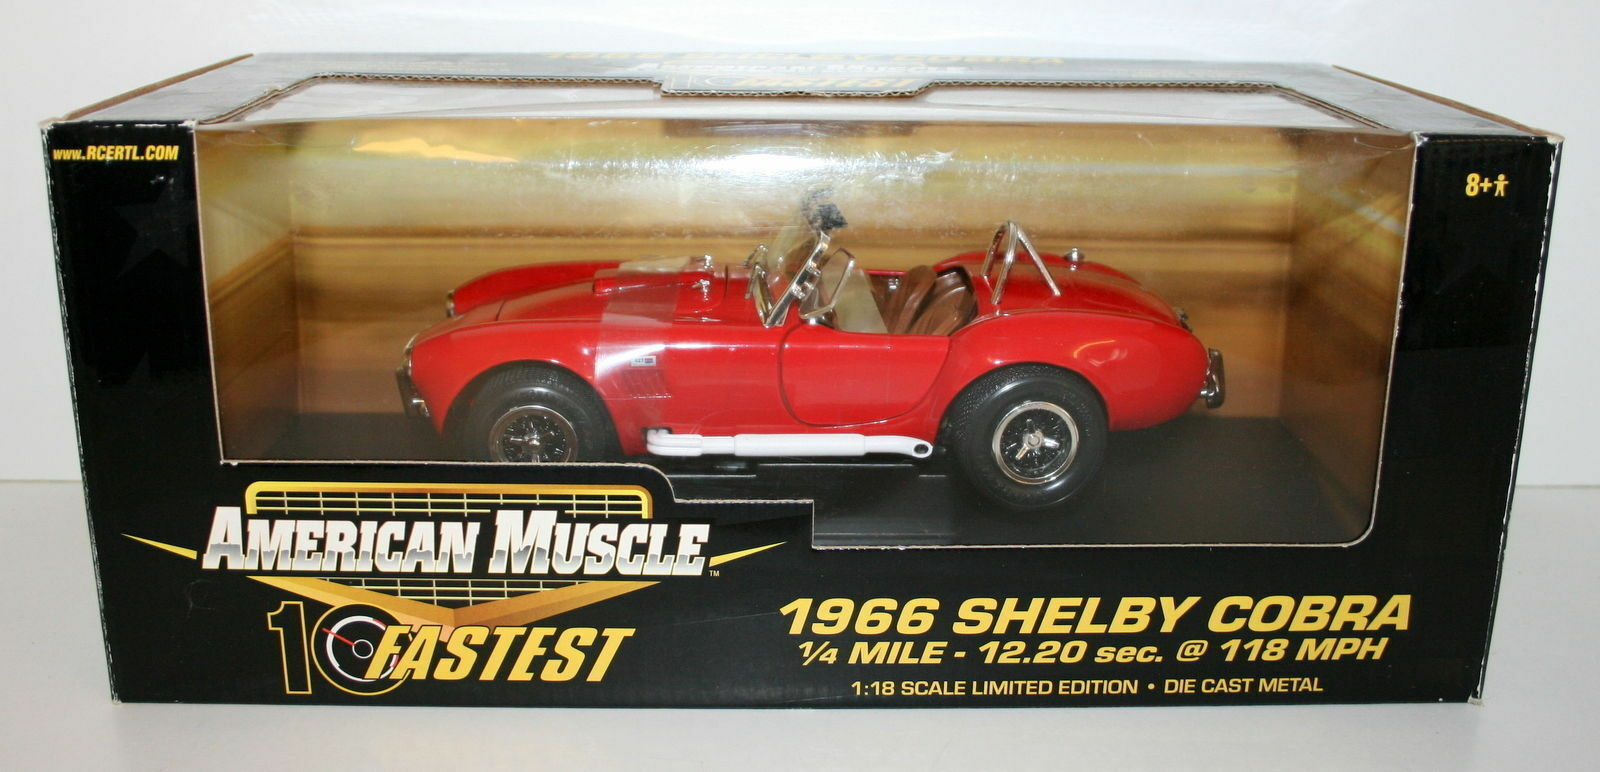 Ertl 1   18 32760 amerikanische muskeln 1966 shelby - cobra - rot